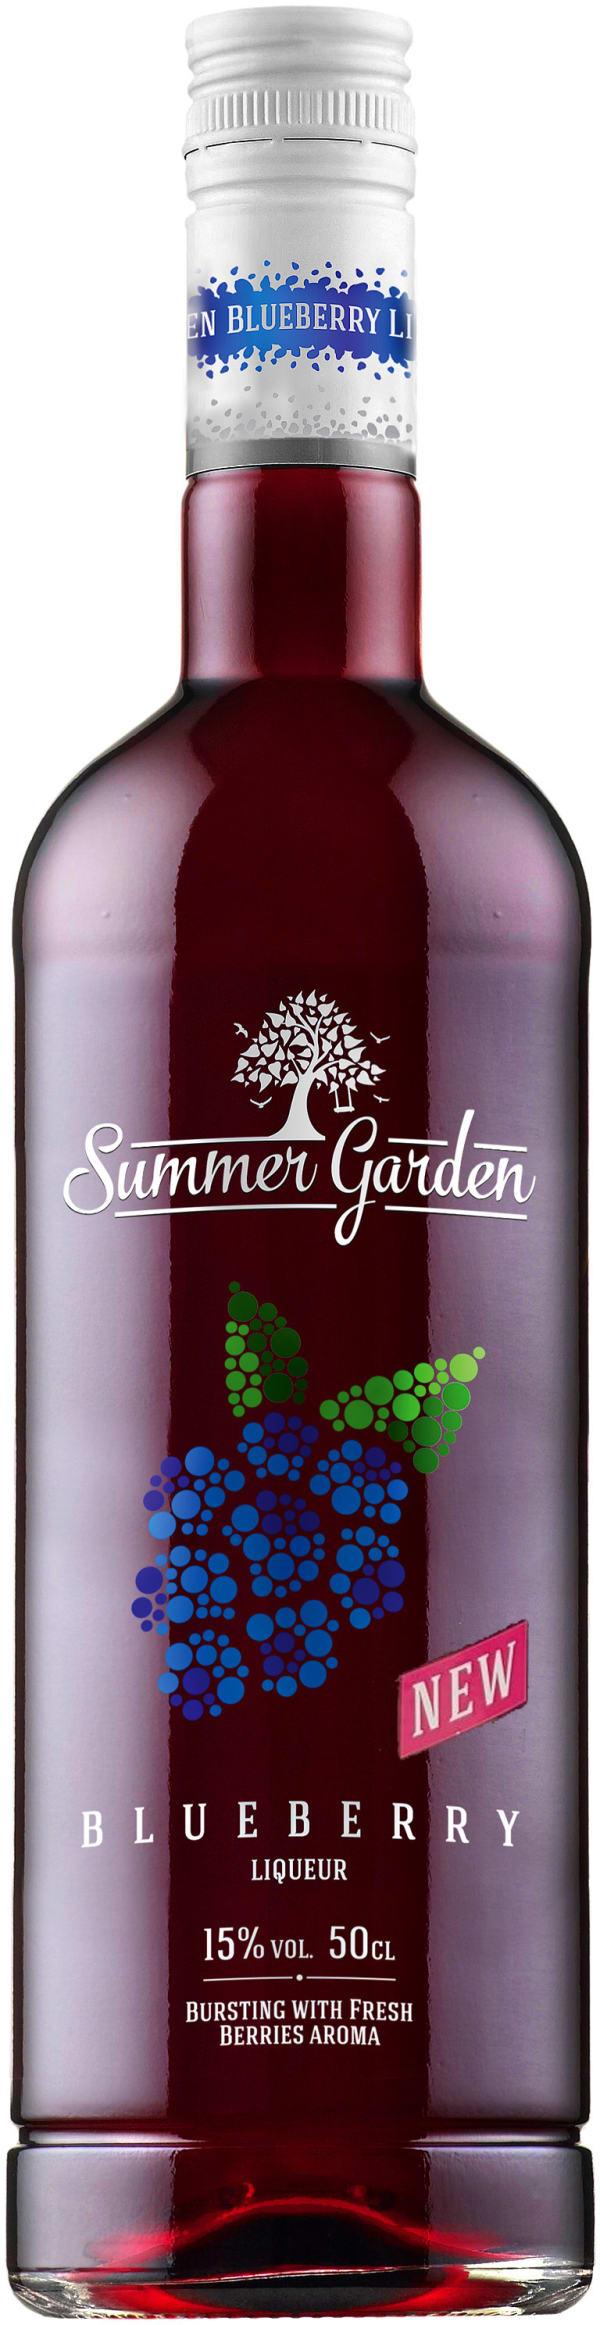 Summer Garden Blueberry